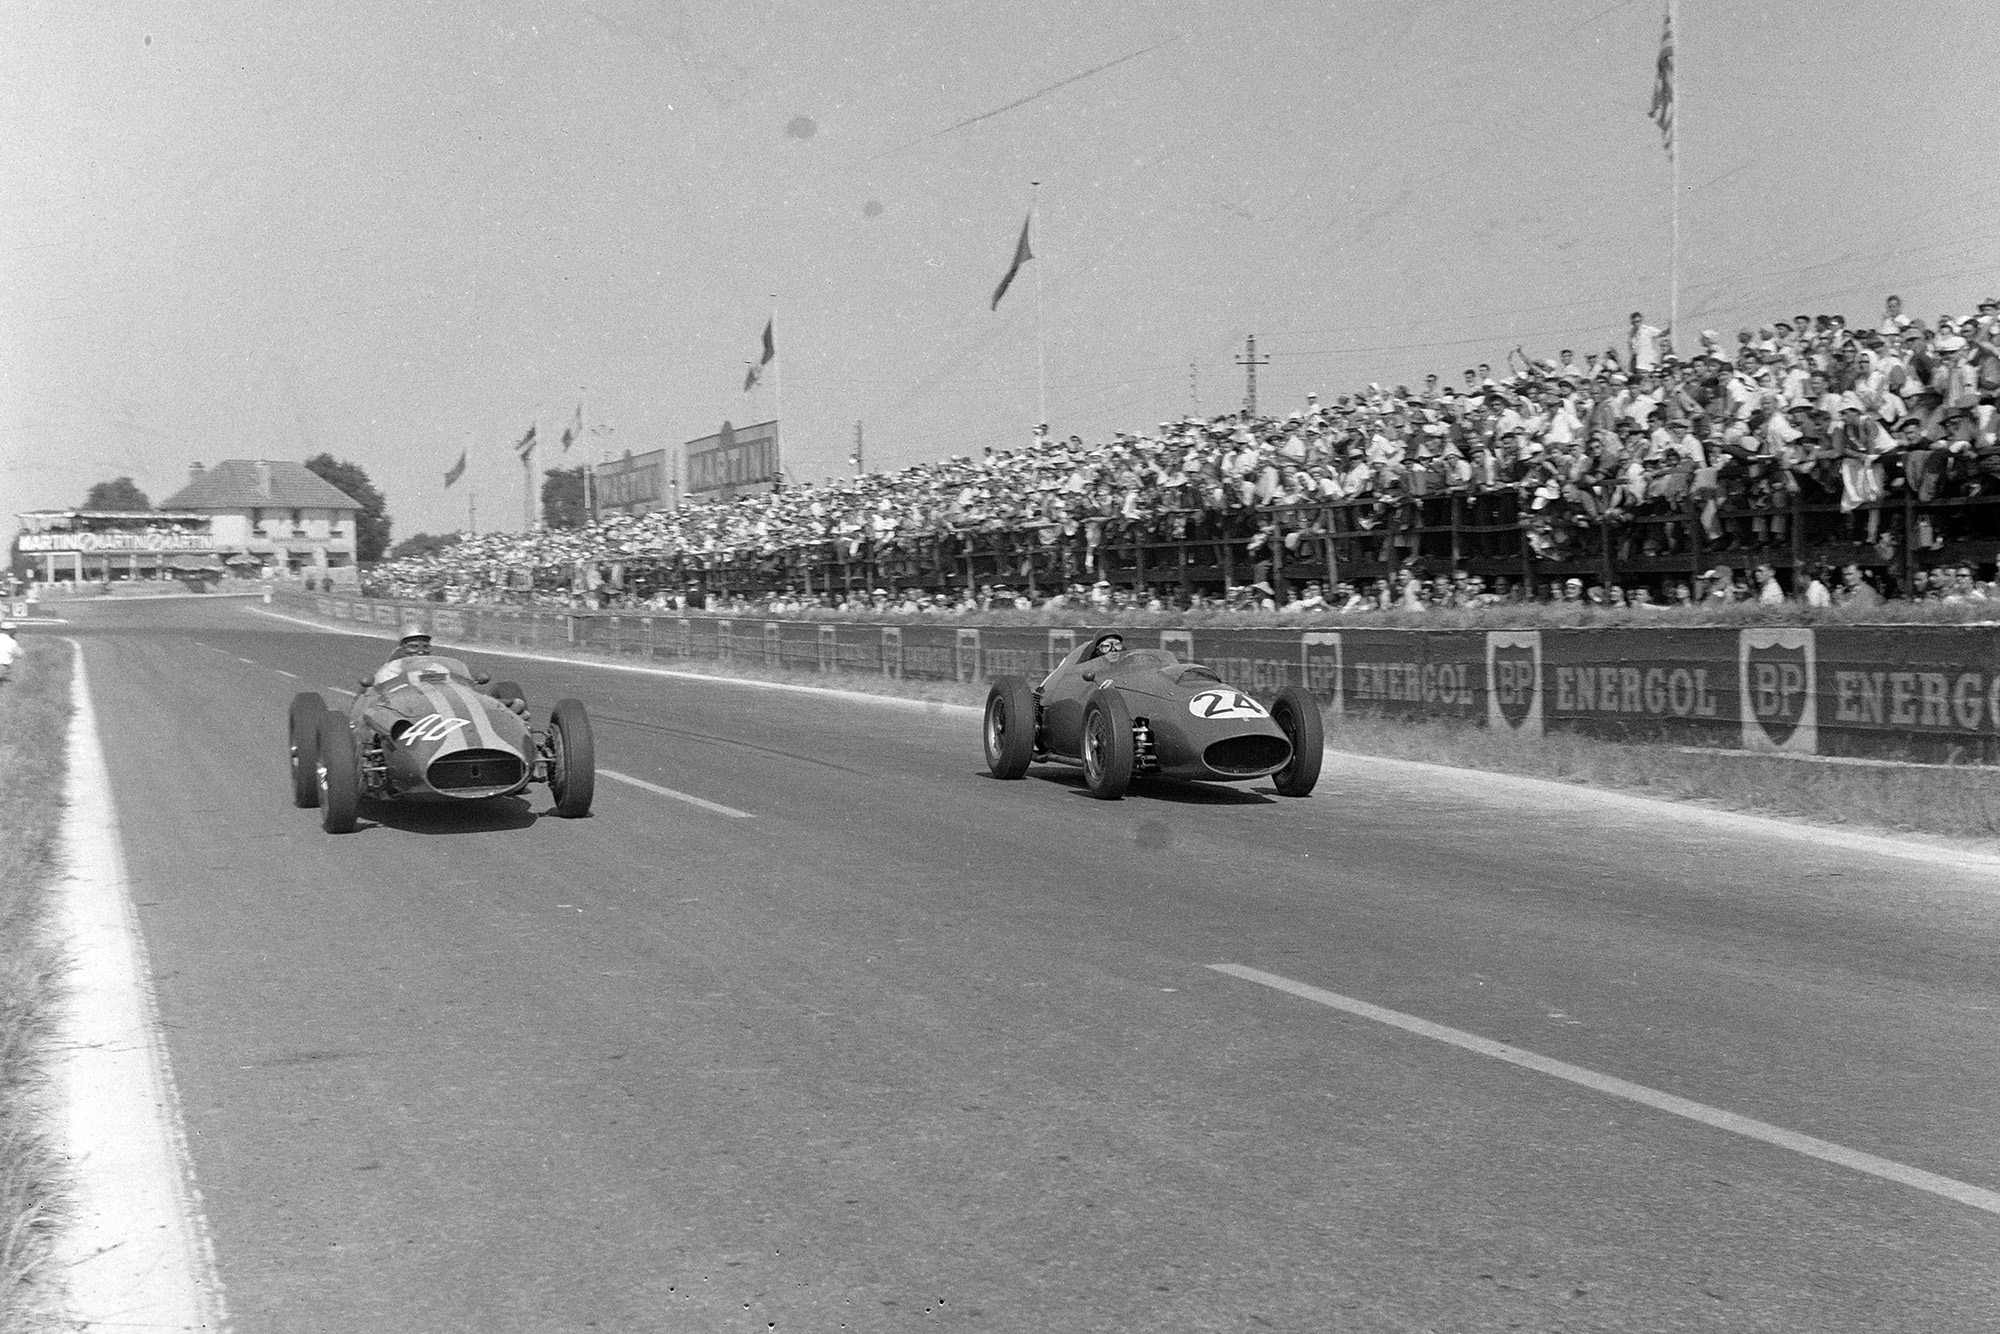 Tony Brooks battles with Giorgio Scarlatti during the 1959 French Grand Prix